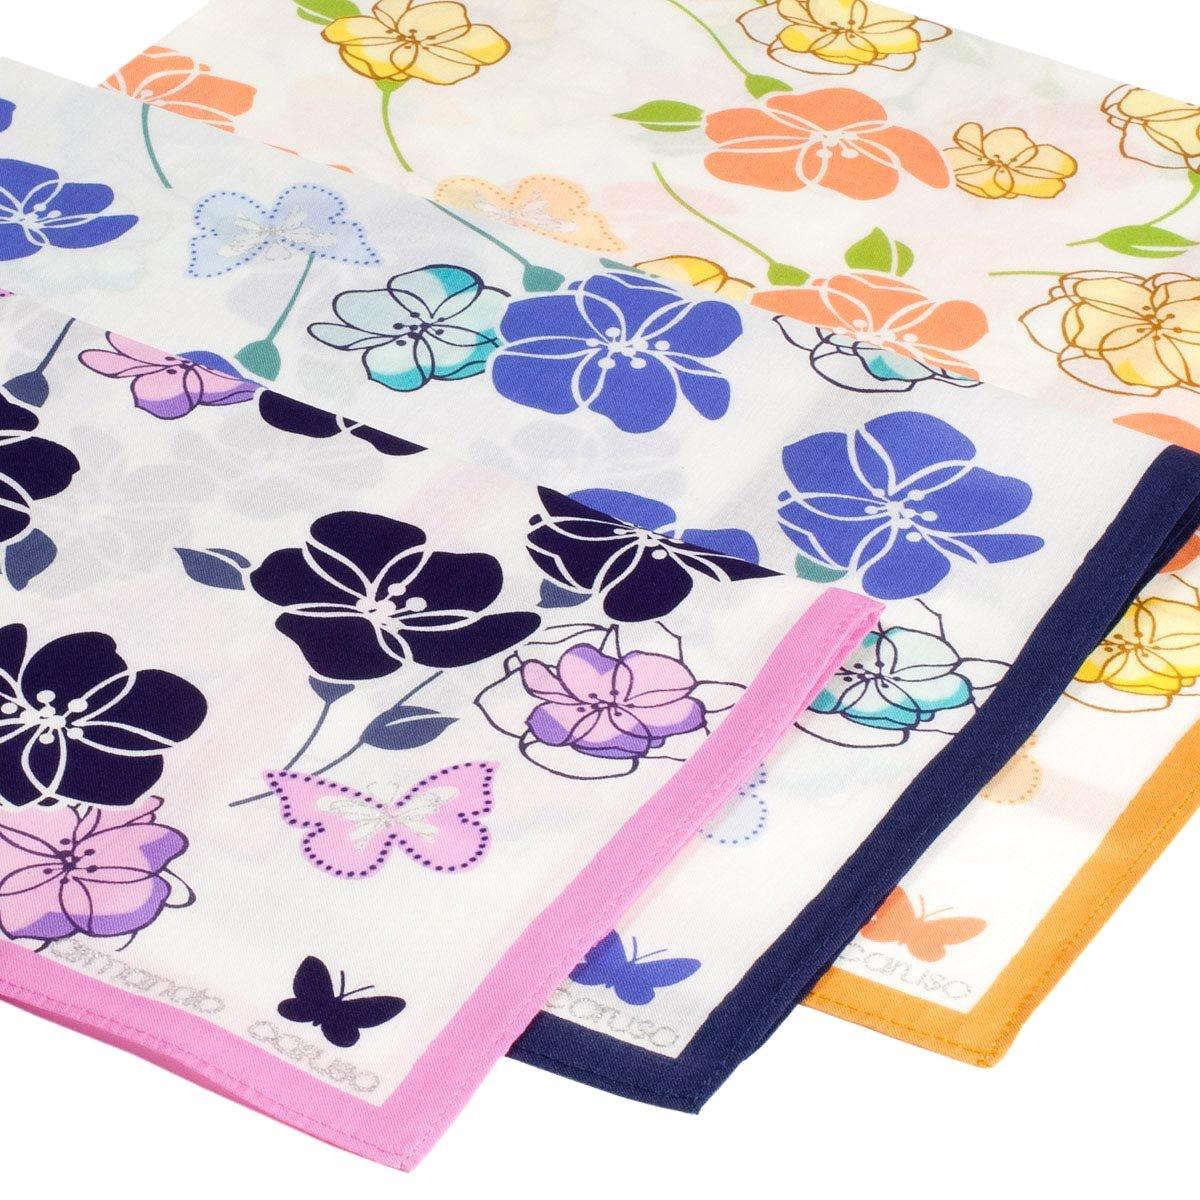 'Florilè ge' printed handkerchiefs - 3 units Armando Caruso